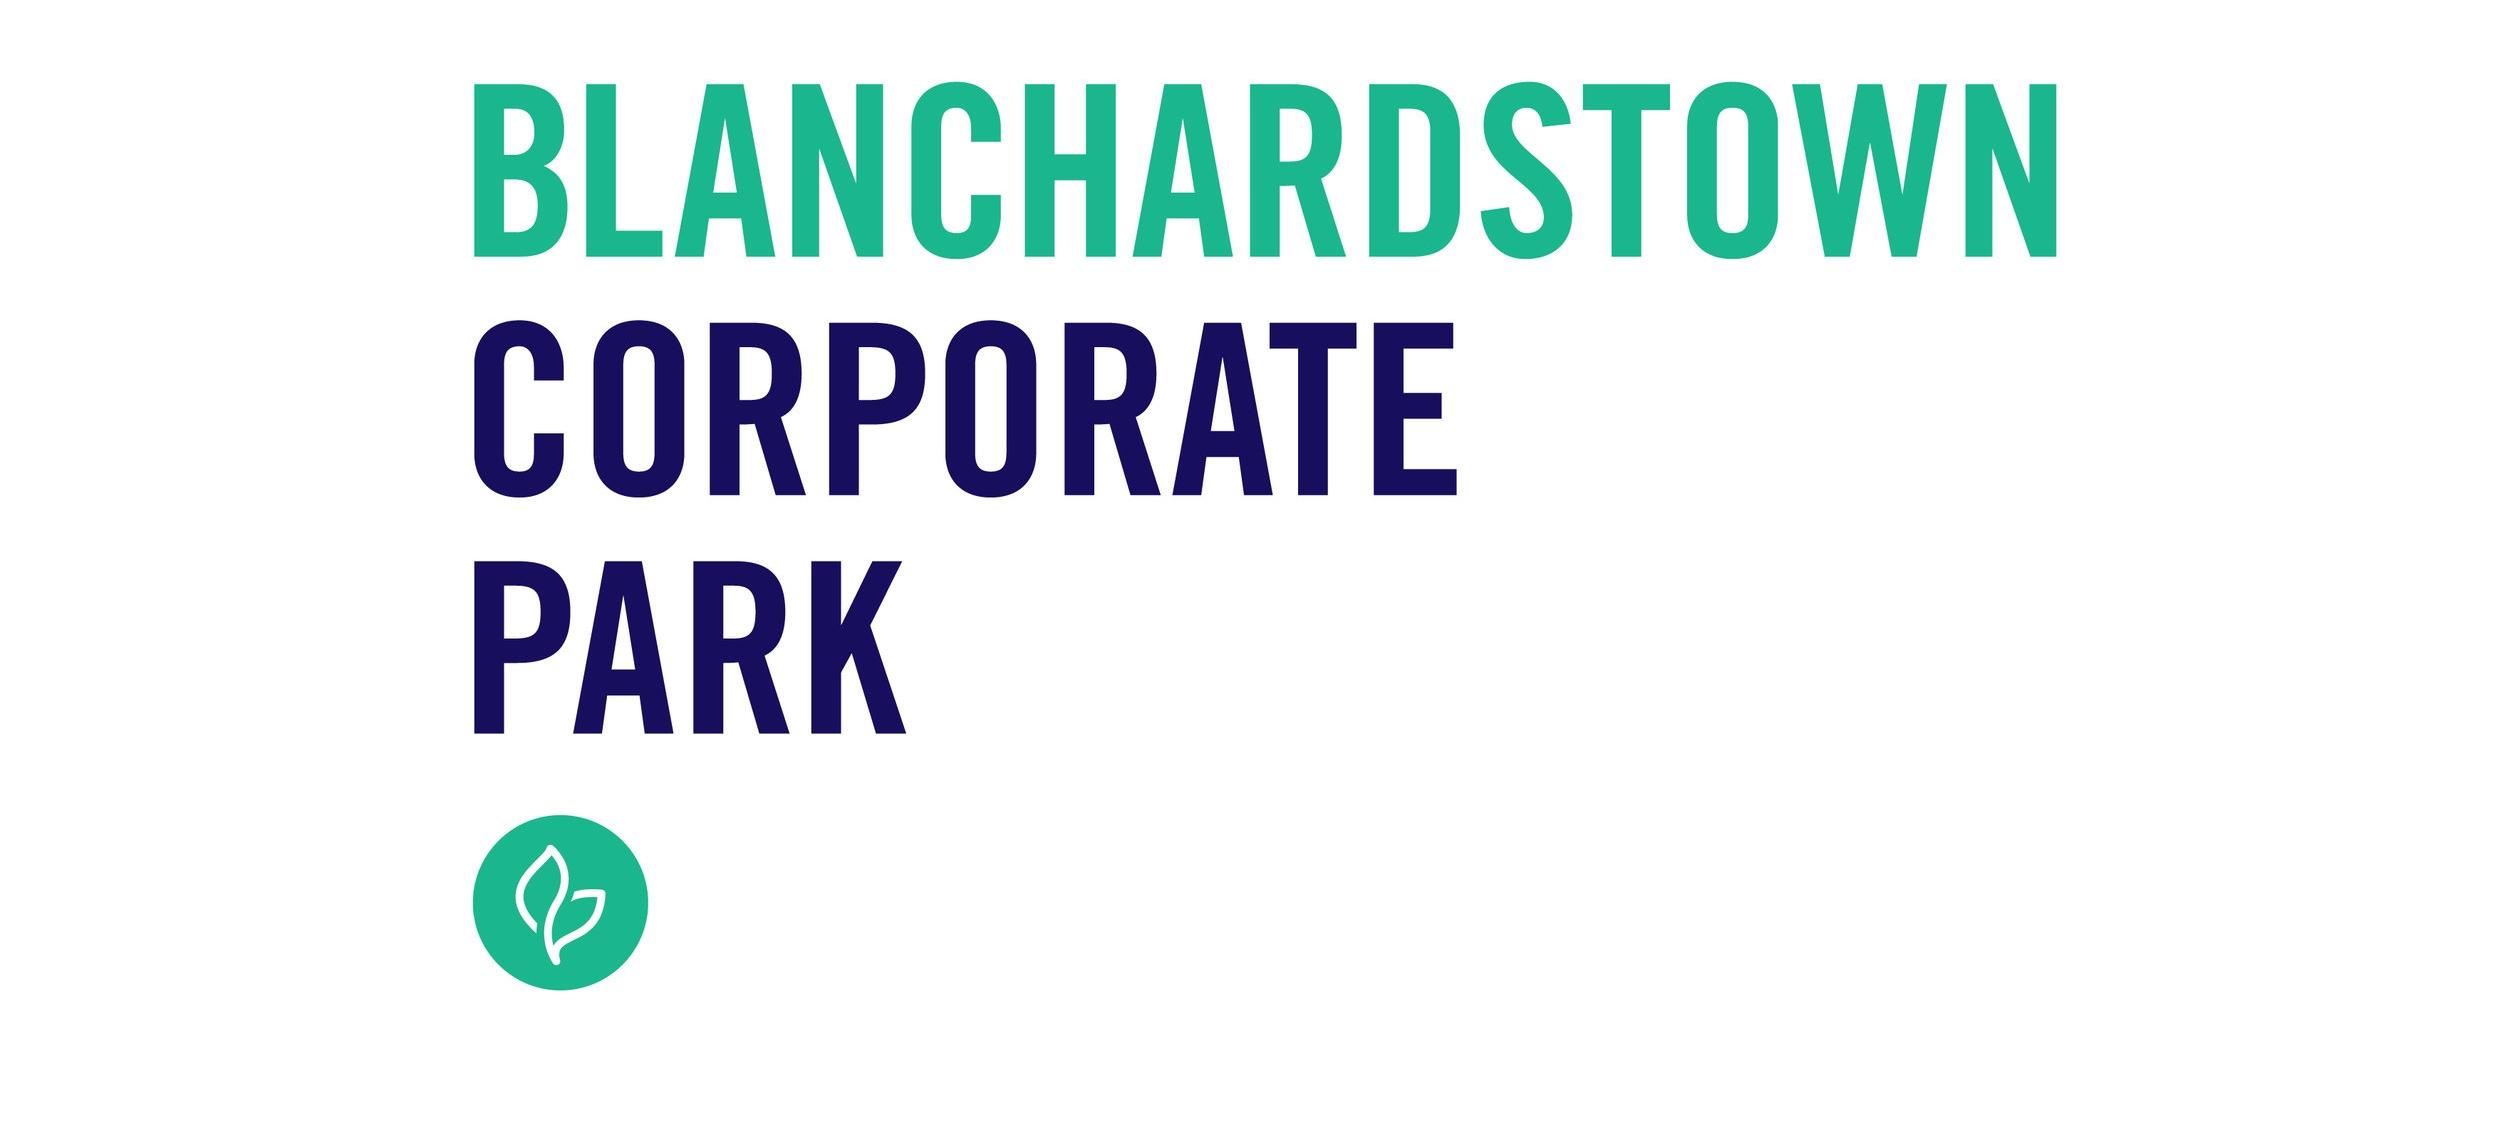 blanchardstown corporate park